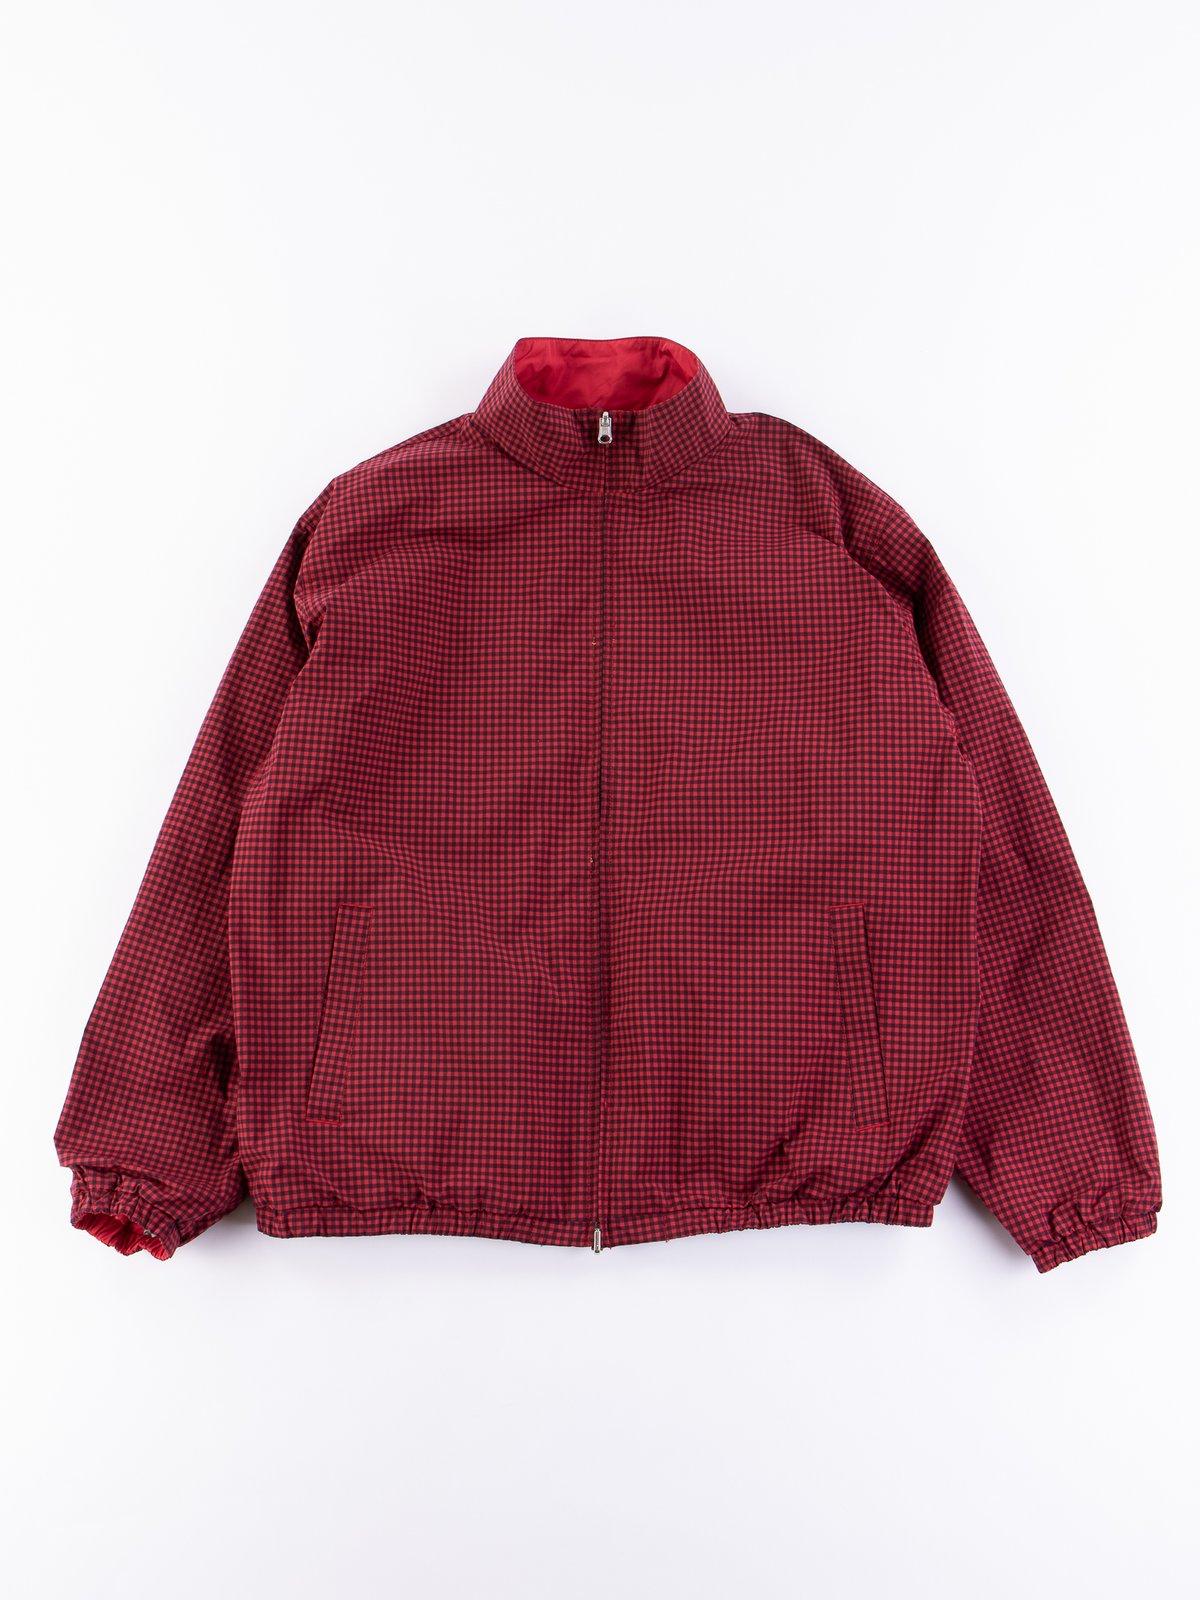 Red Gingham Reversible Jacket - Image 1